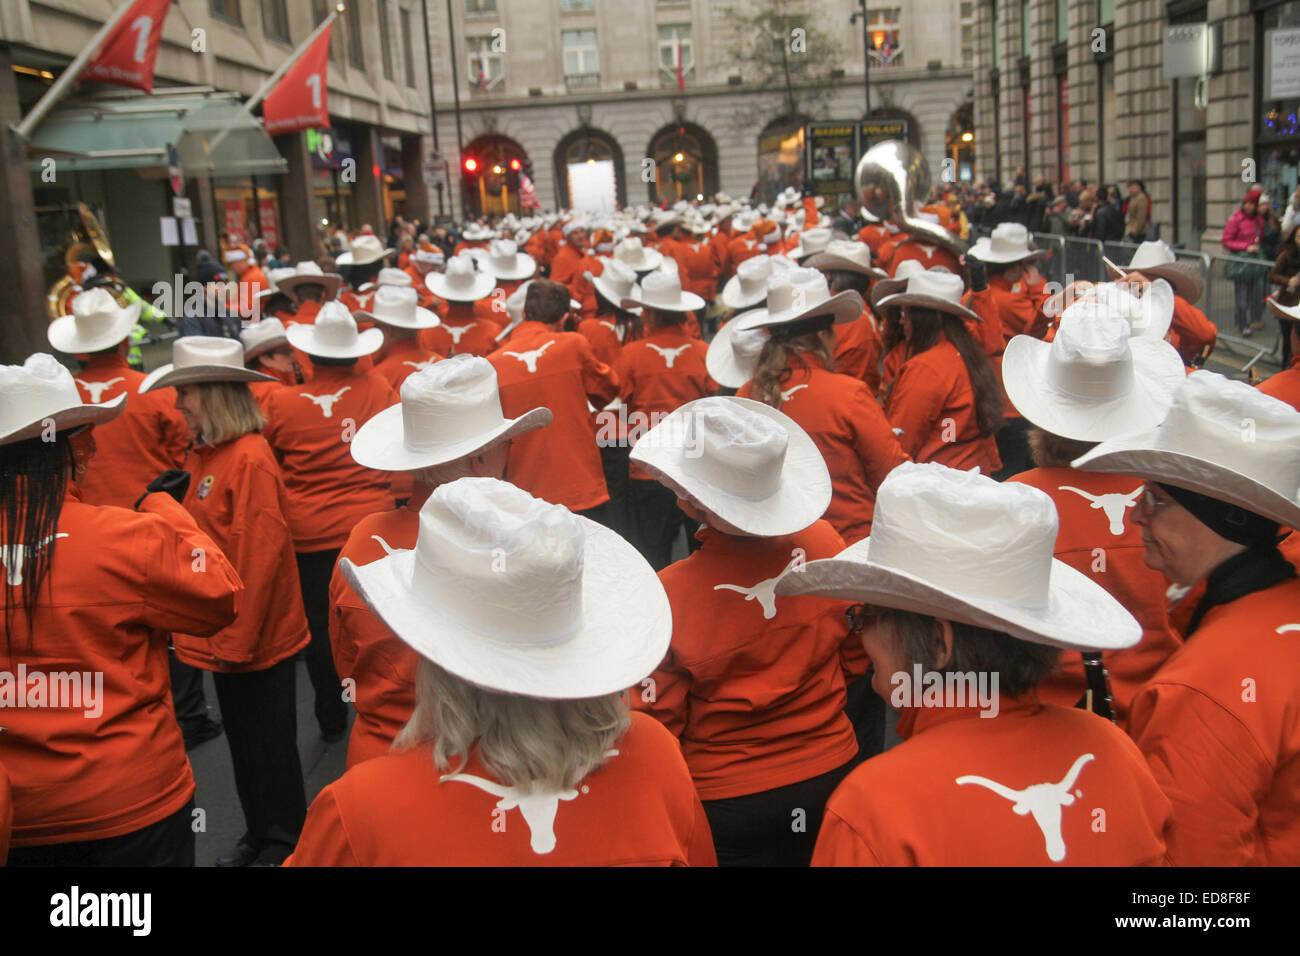 London, UK. 1 January 2015. University of Texas Longhorn band members ahead of the parade start at noon. Londoners - Stock Image